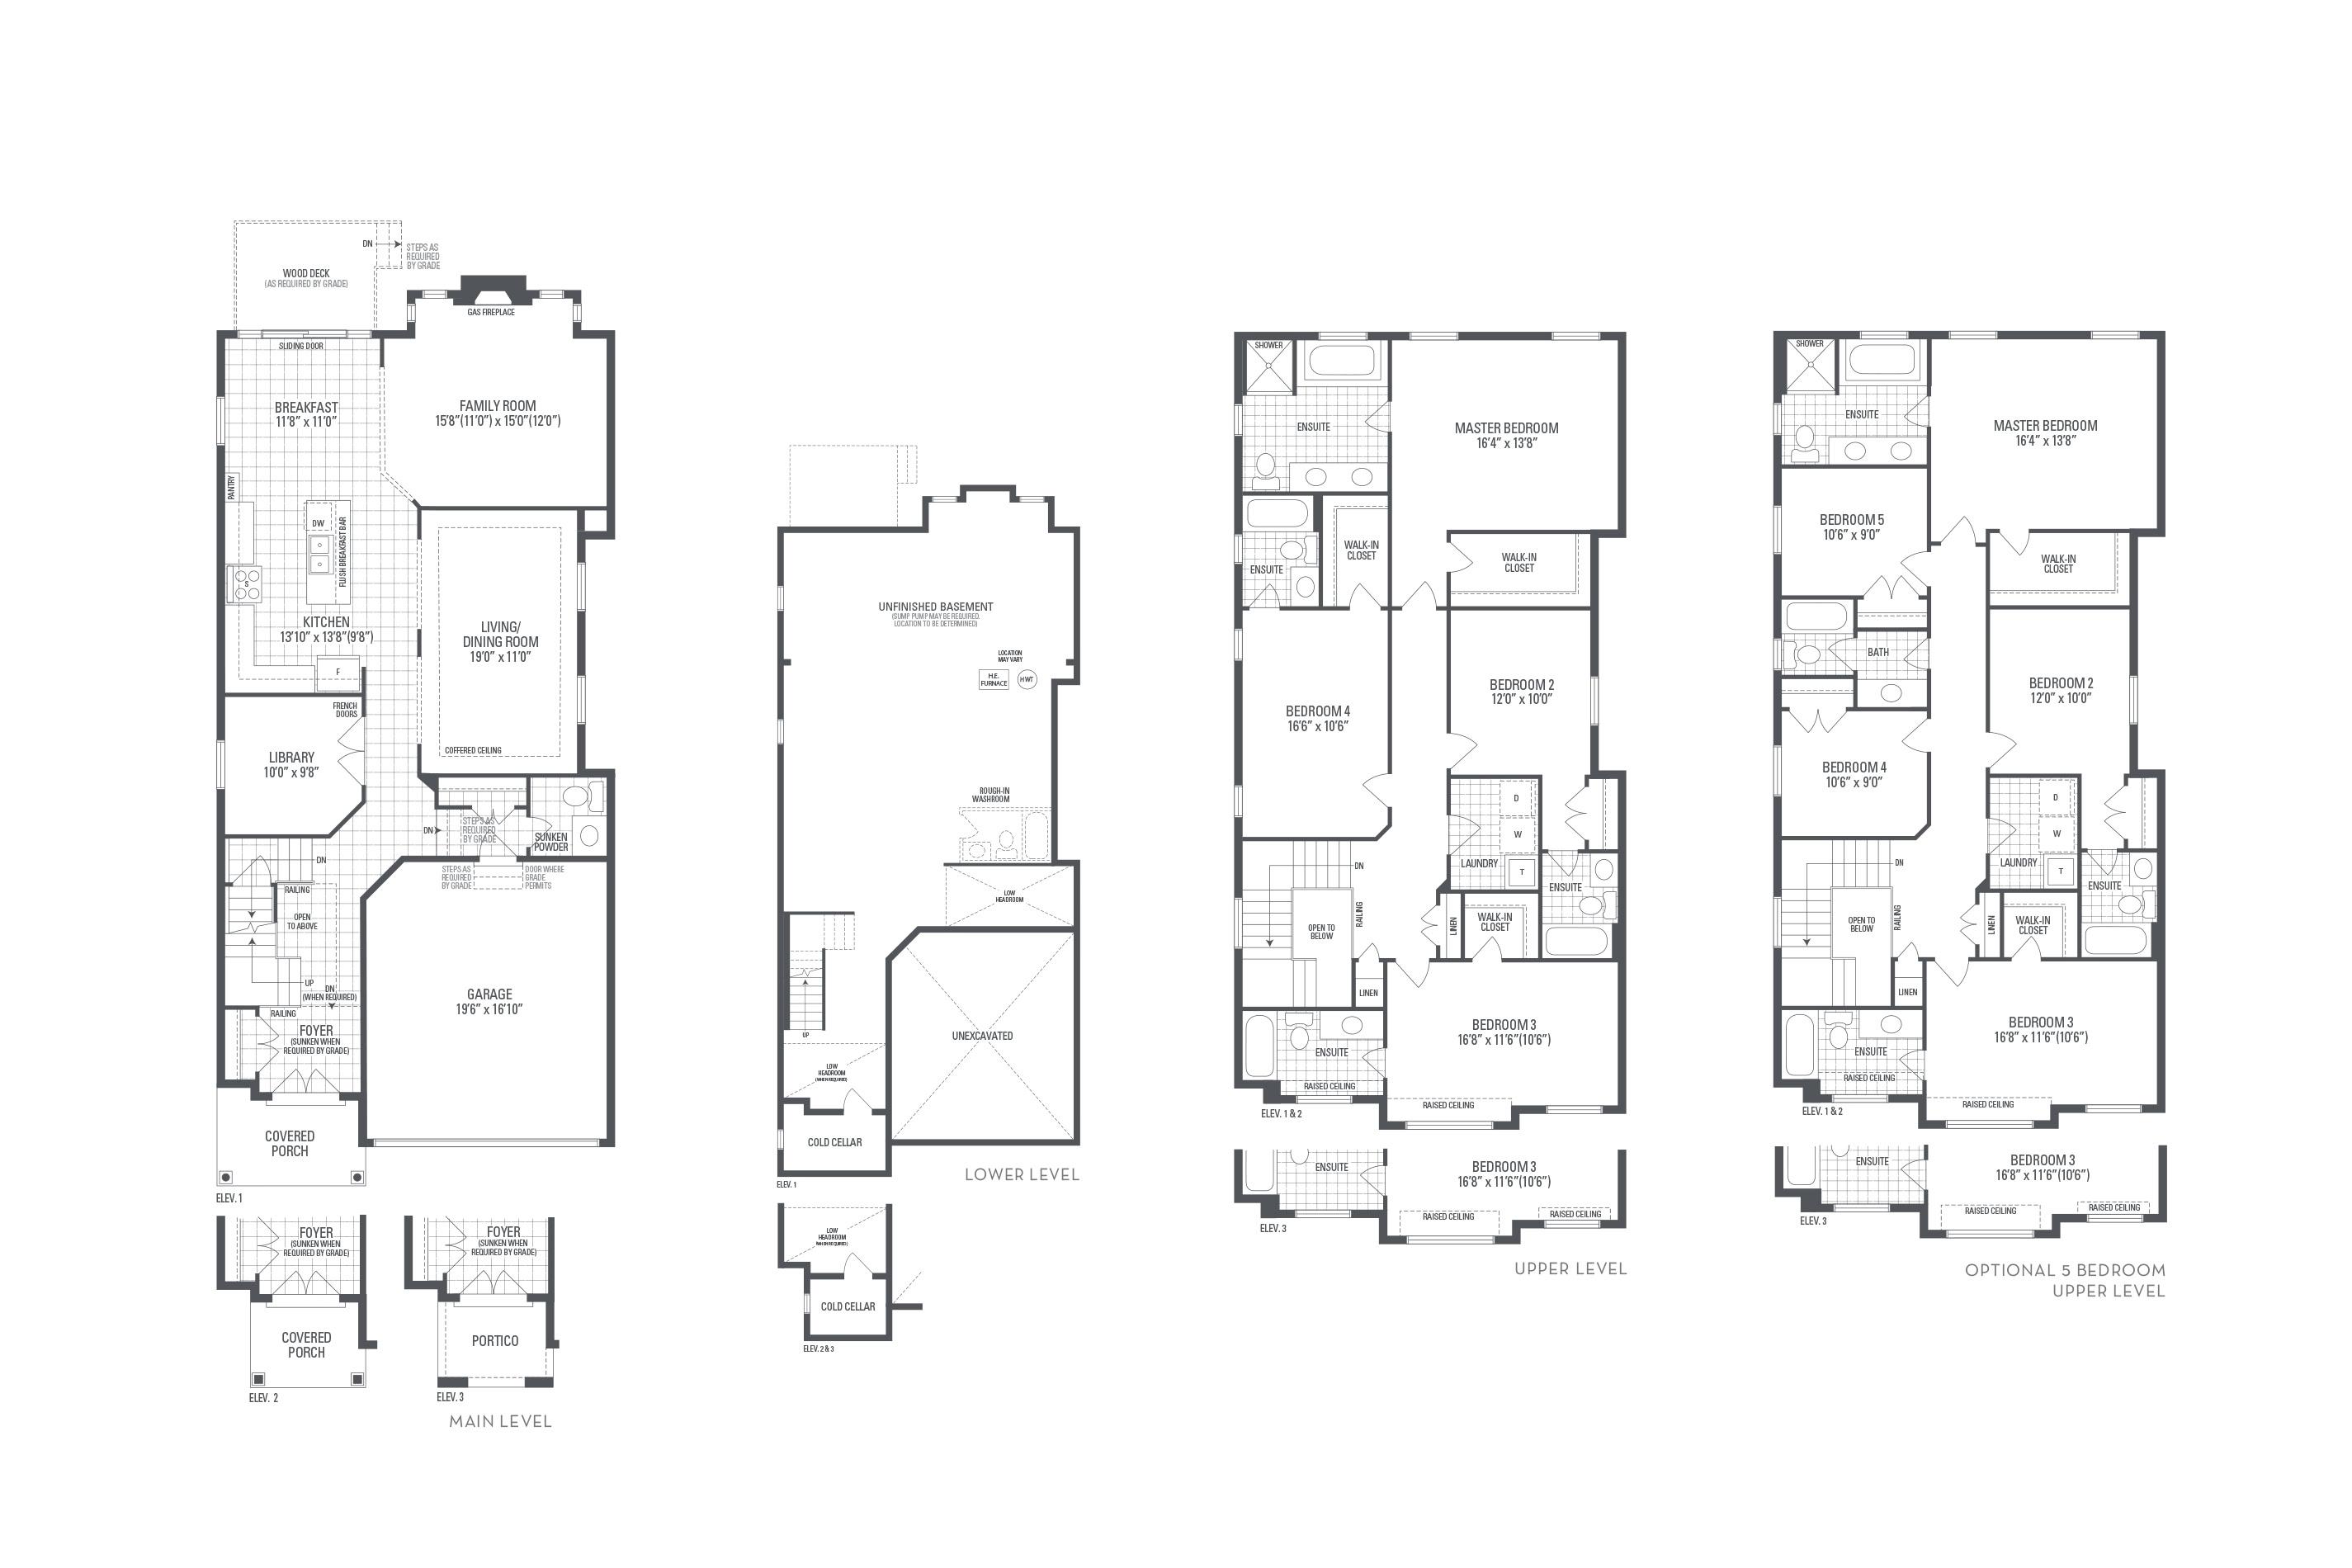 Bronte 09 Elev. 2 Floorplan